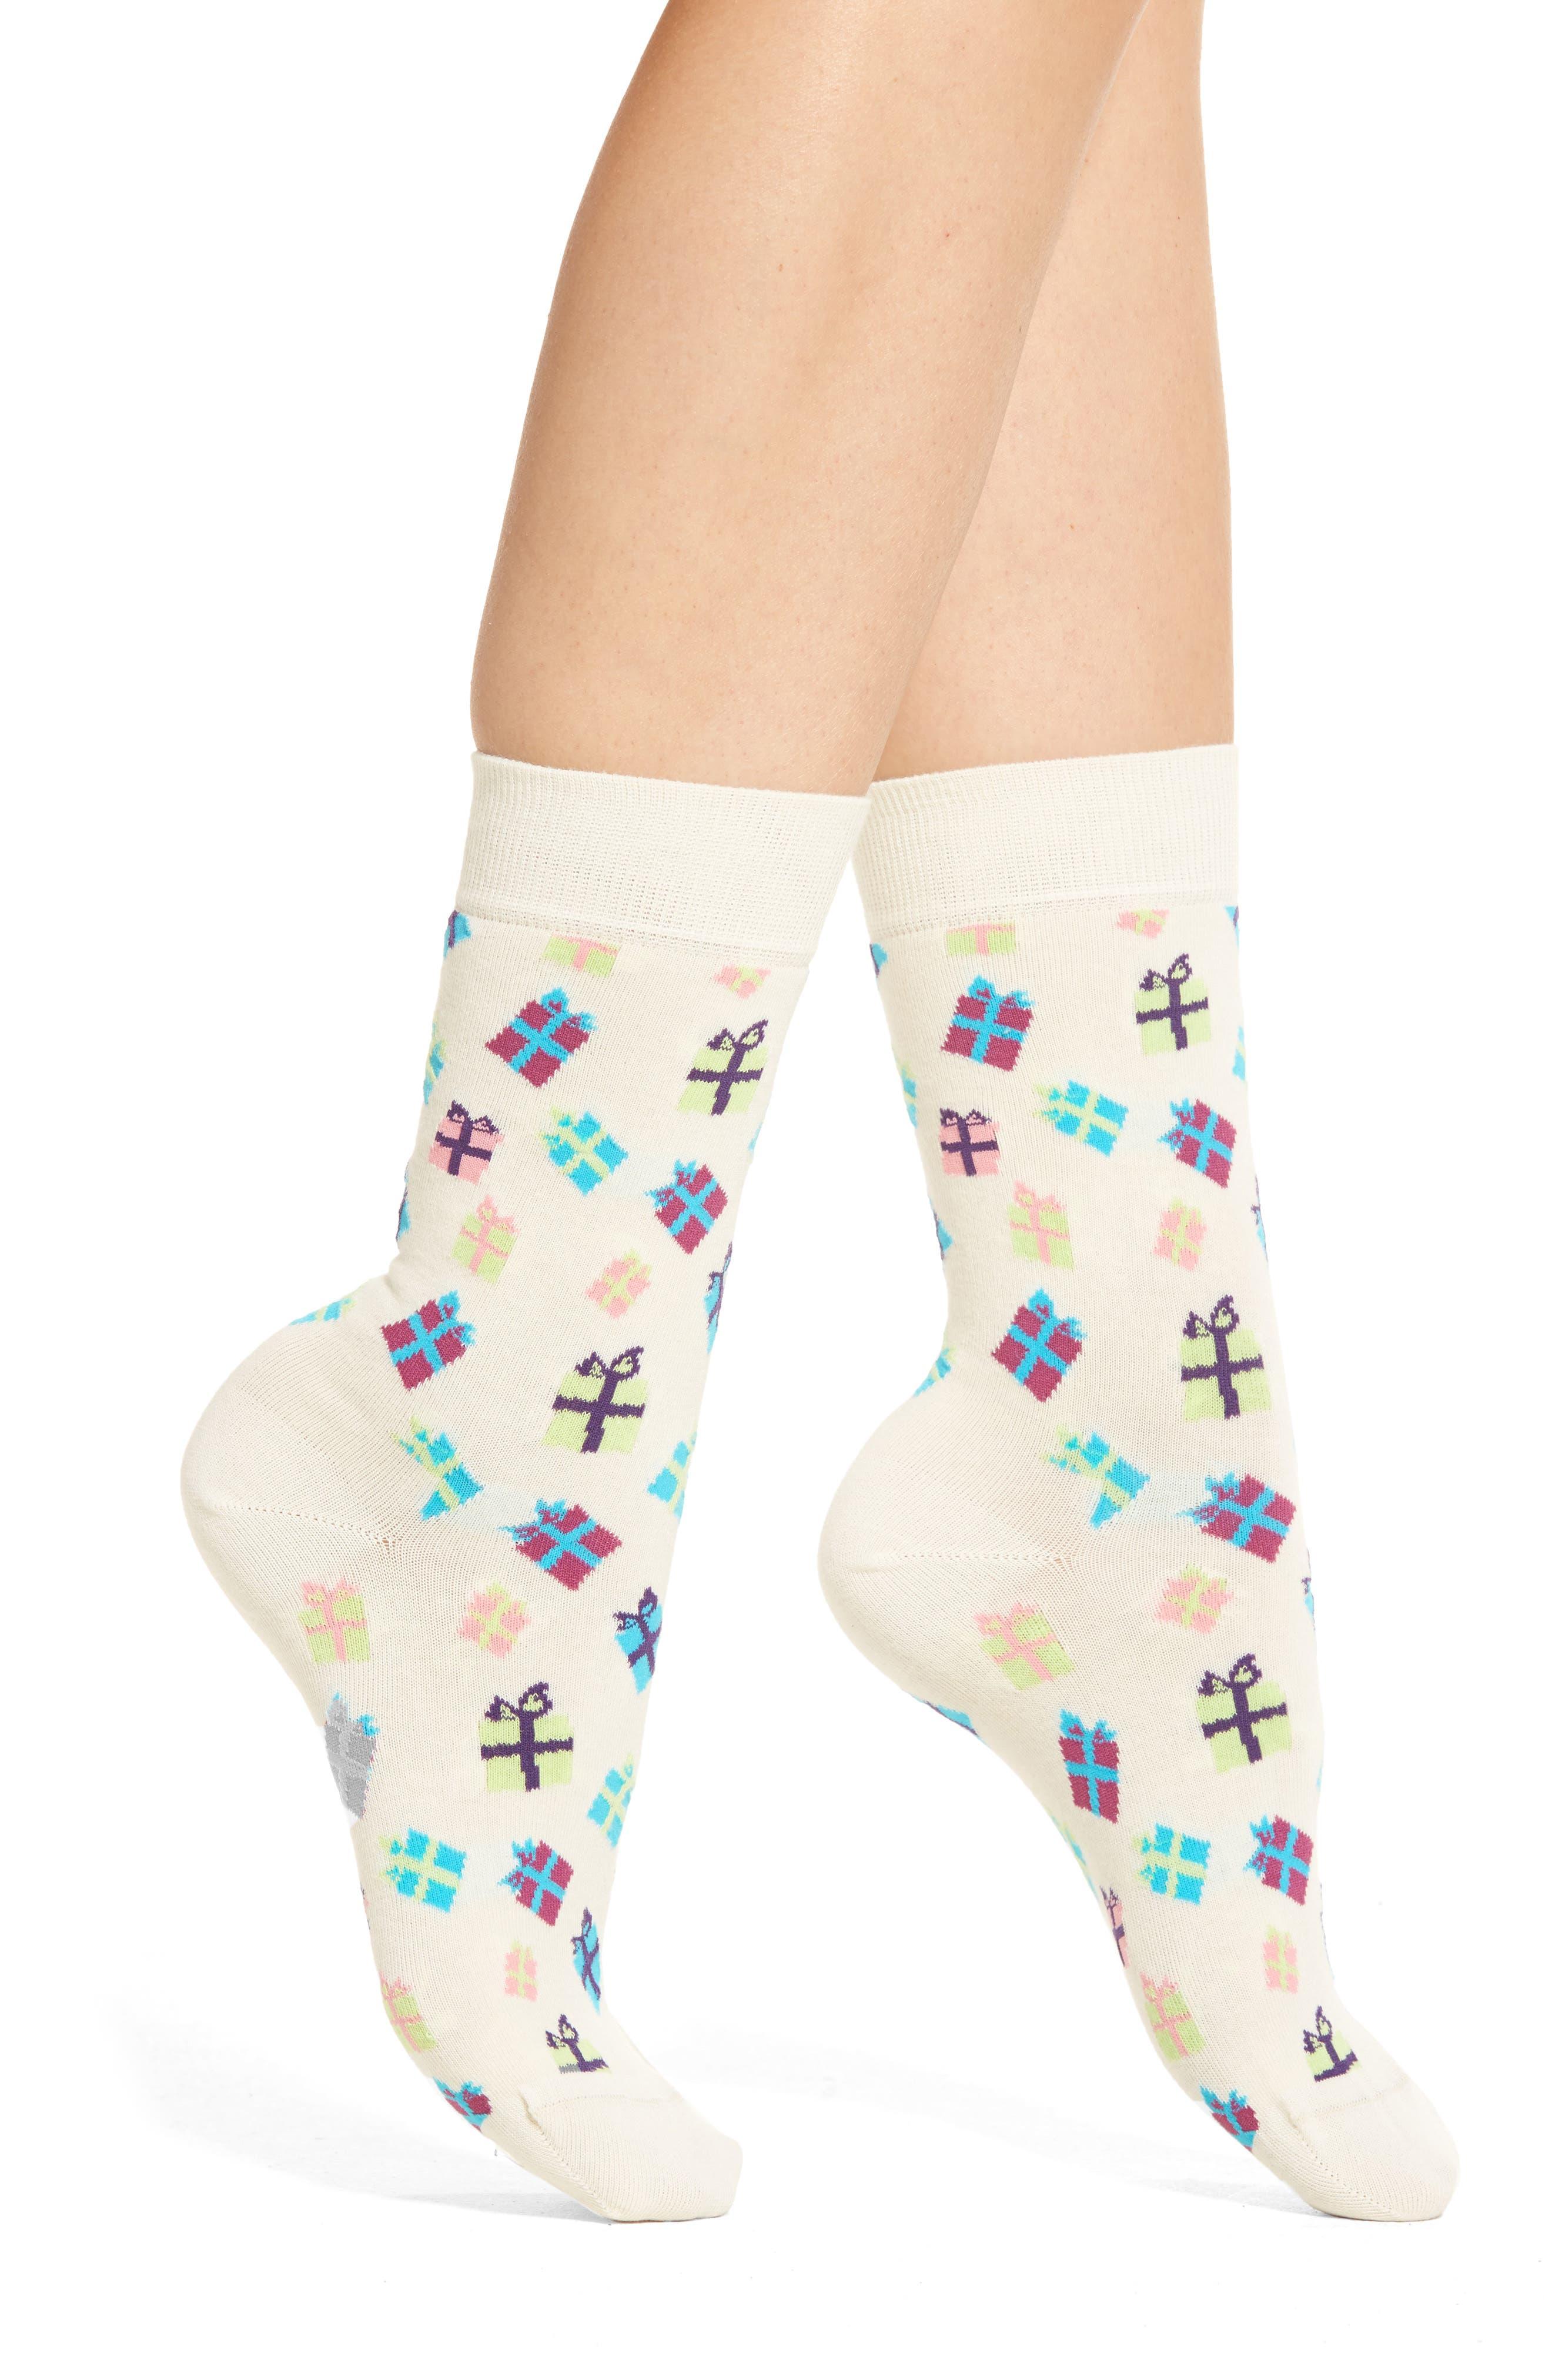 Happy Socks Christmas Gifts Crew Socks (3 for $24)